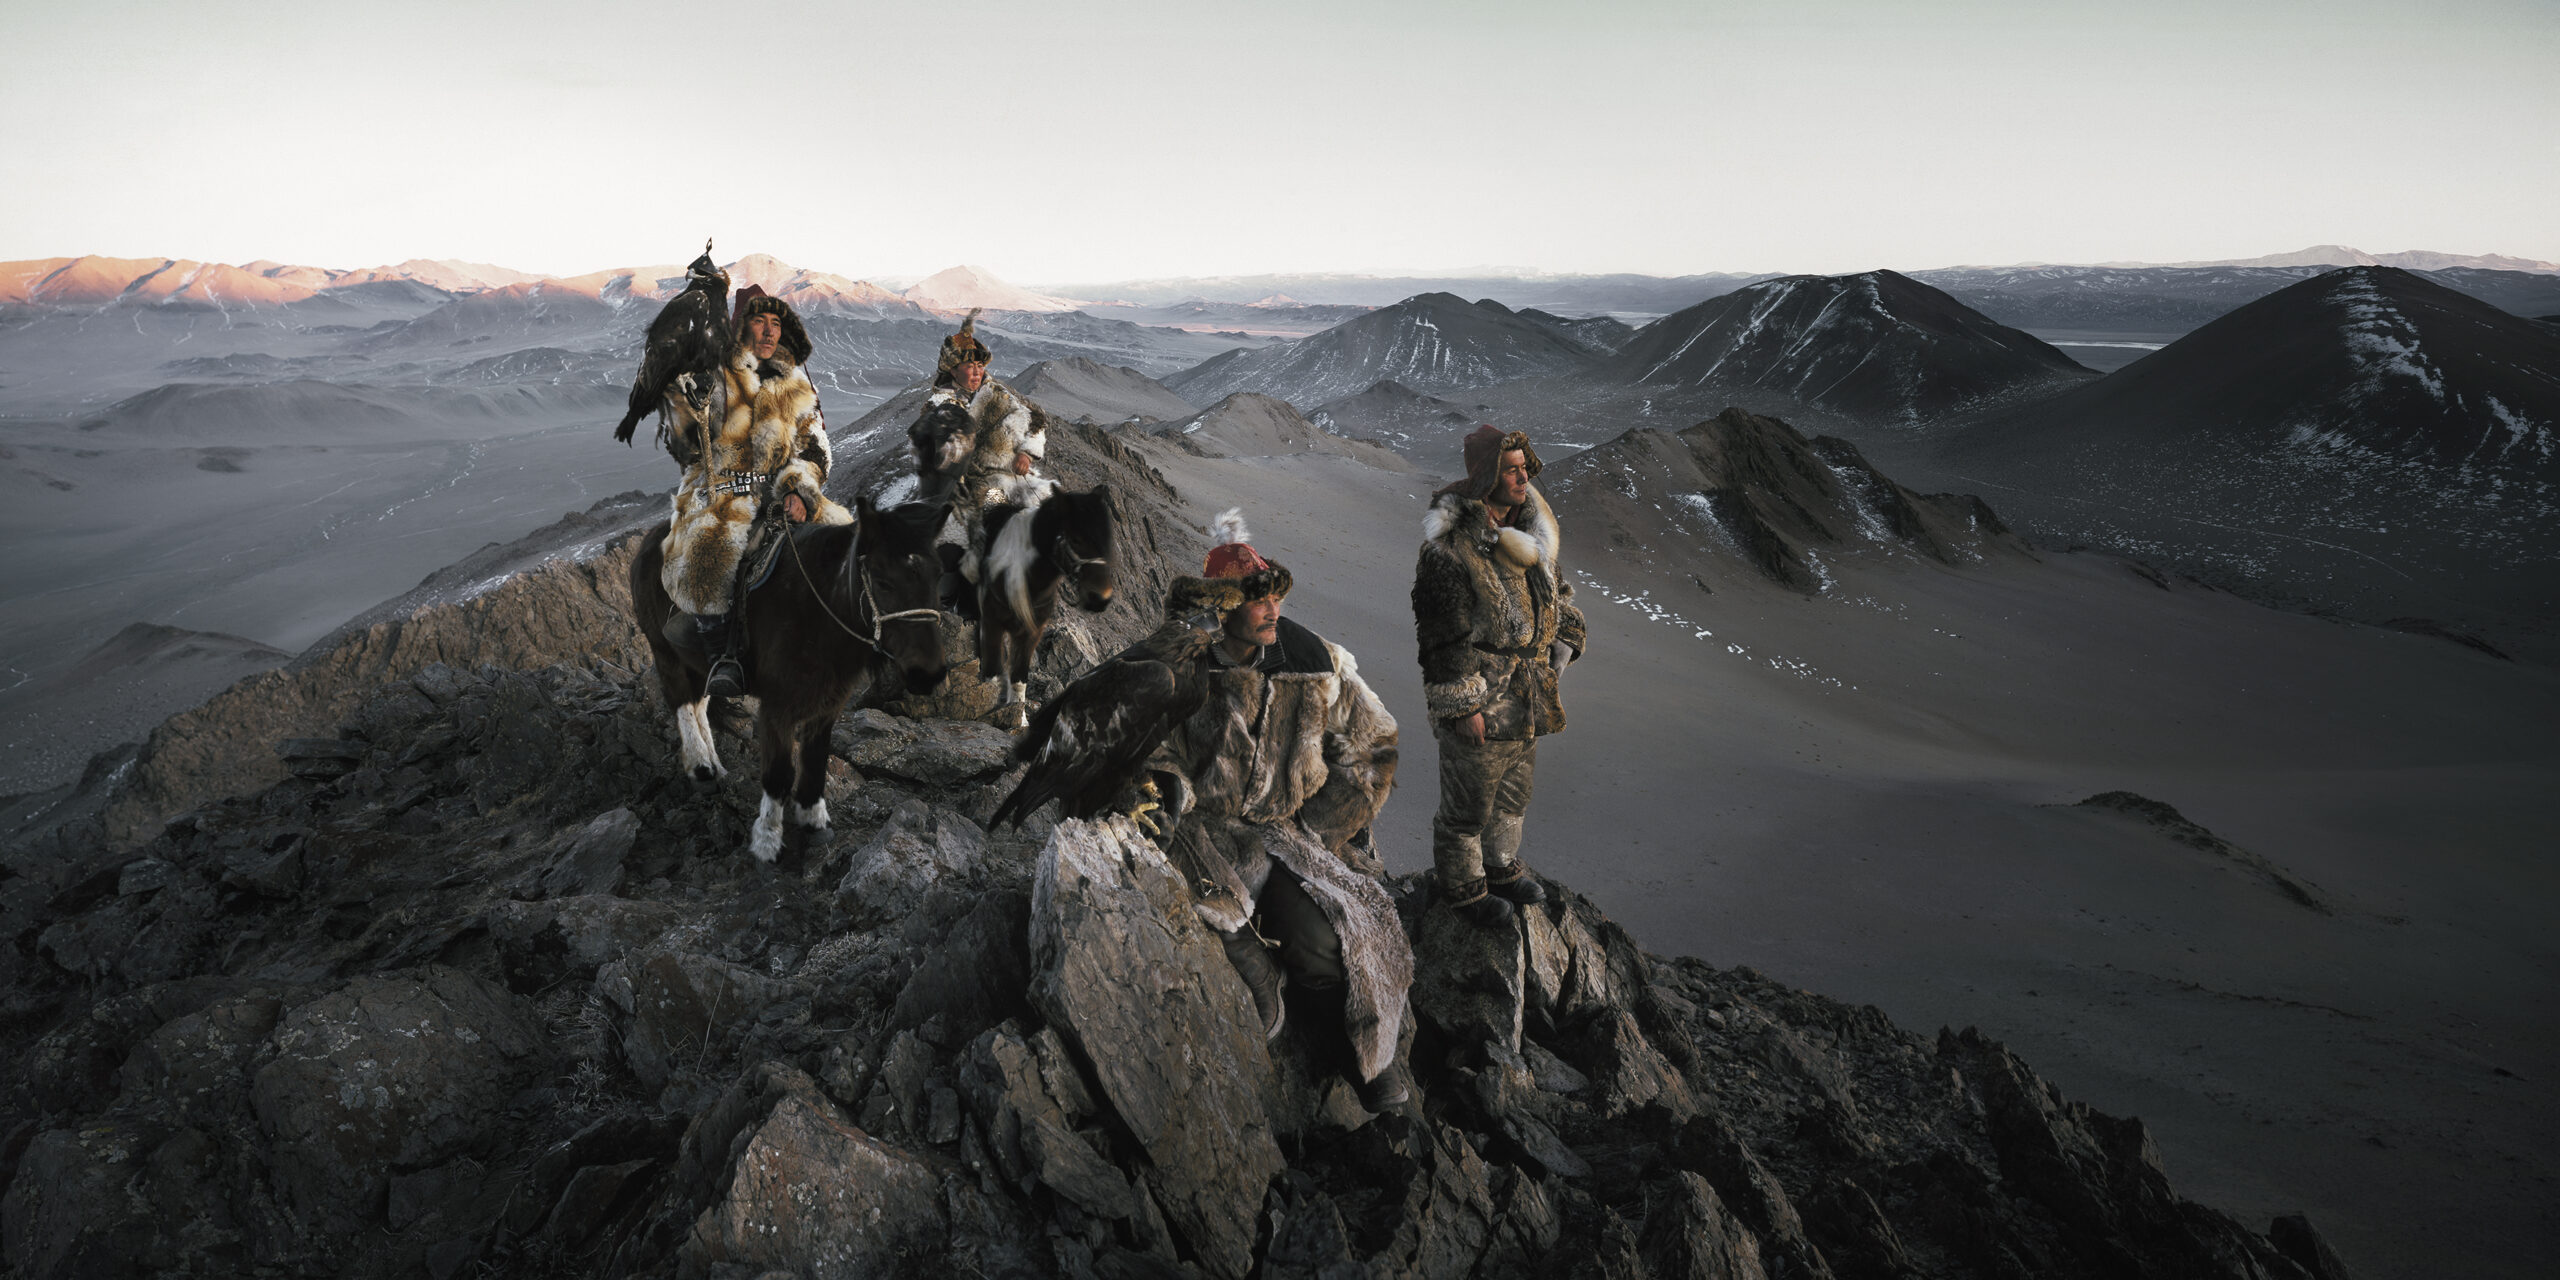 Xardembek, Xasn, Sani, Kemi, Songinst, Mongolia